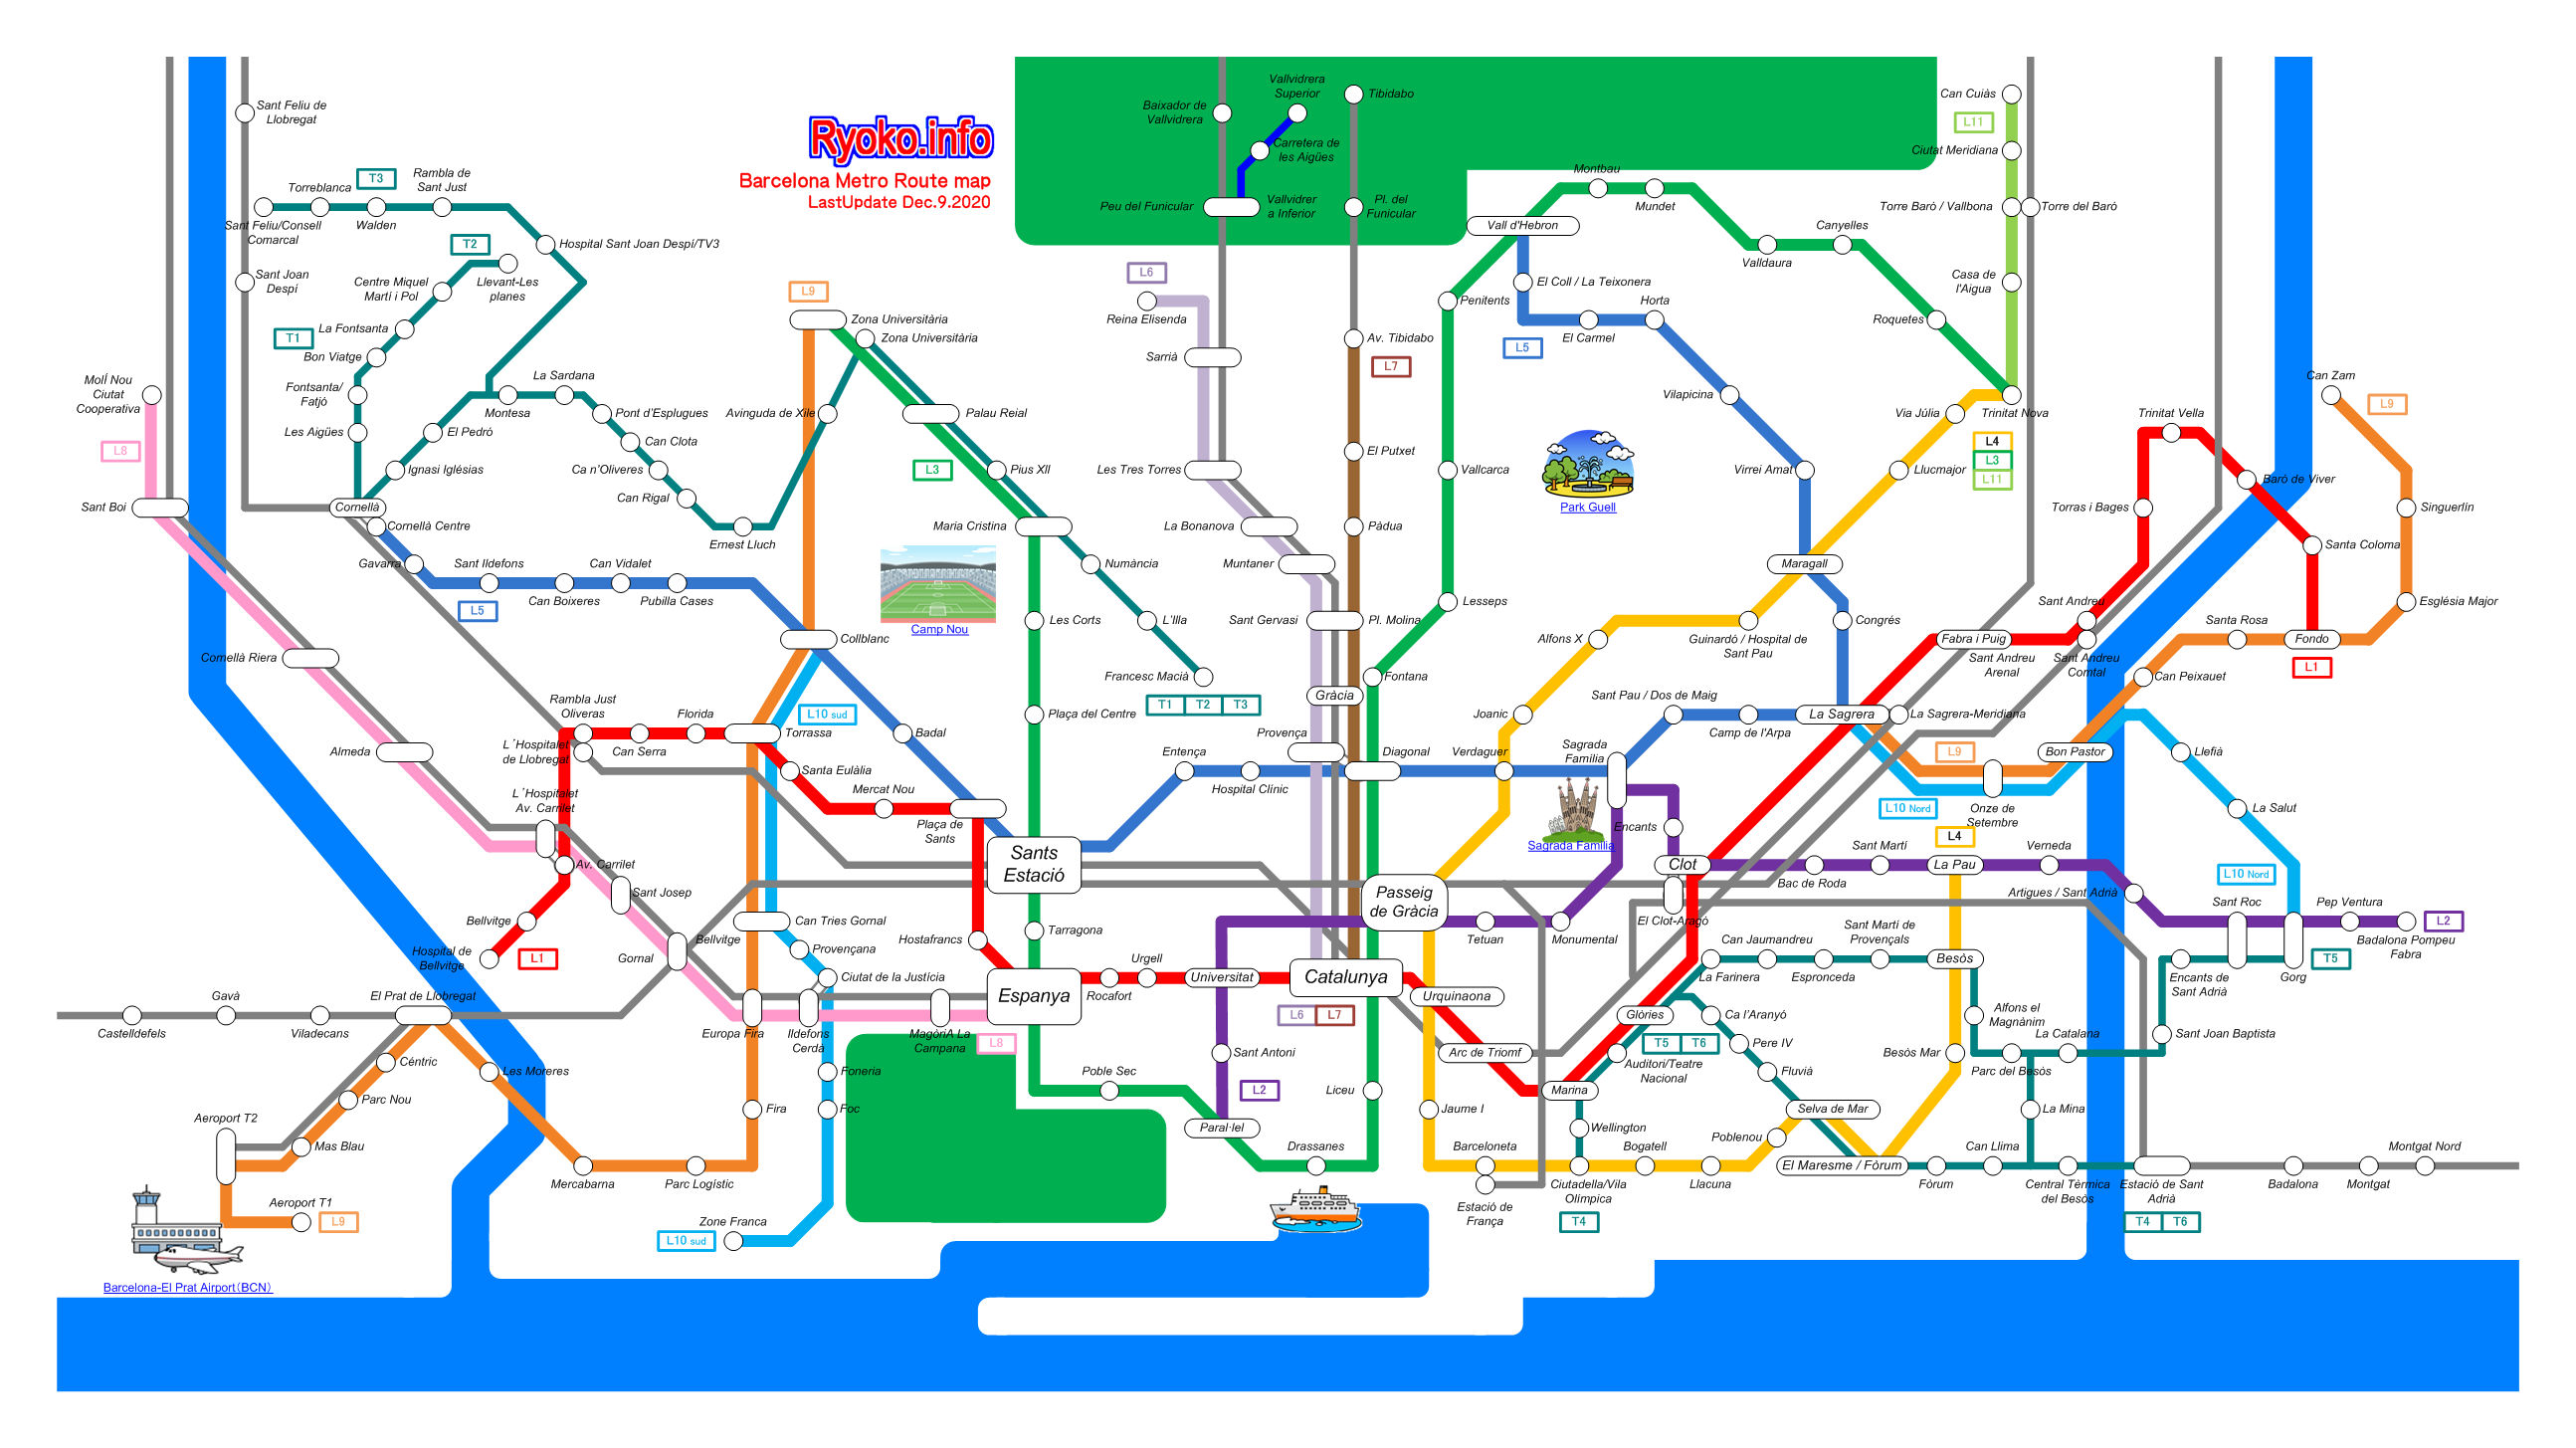 Barcelona Metro Route map on bolivia map, catalonia map, bologna map, st. petersburg map, spain map, new york city map, crete map, europe map, frankfurt map, istanbul map, chicago map, marseille map, rhone river map, madrid map, belgrade map, paris map, san sebastian map, world map, porto map, lisbon map,